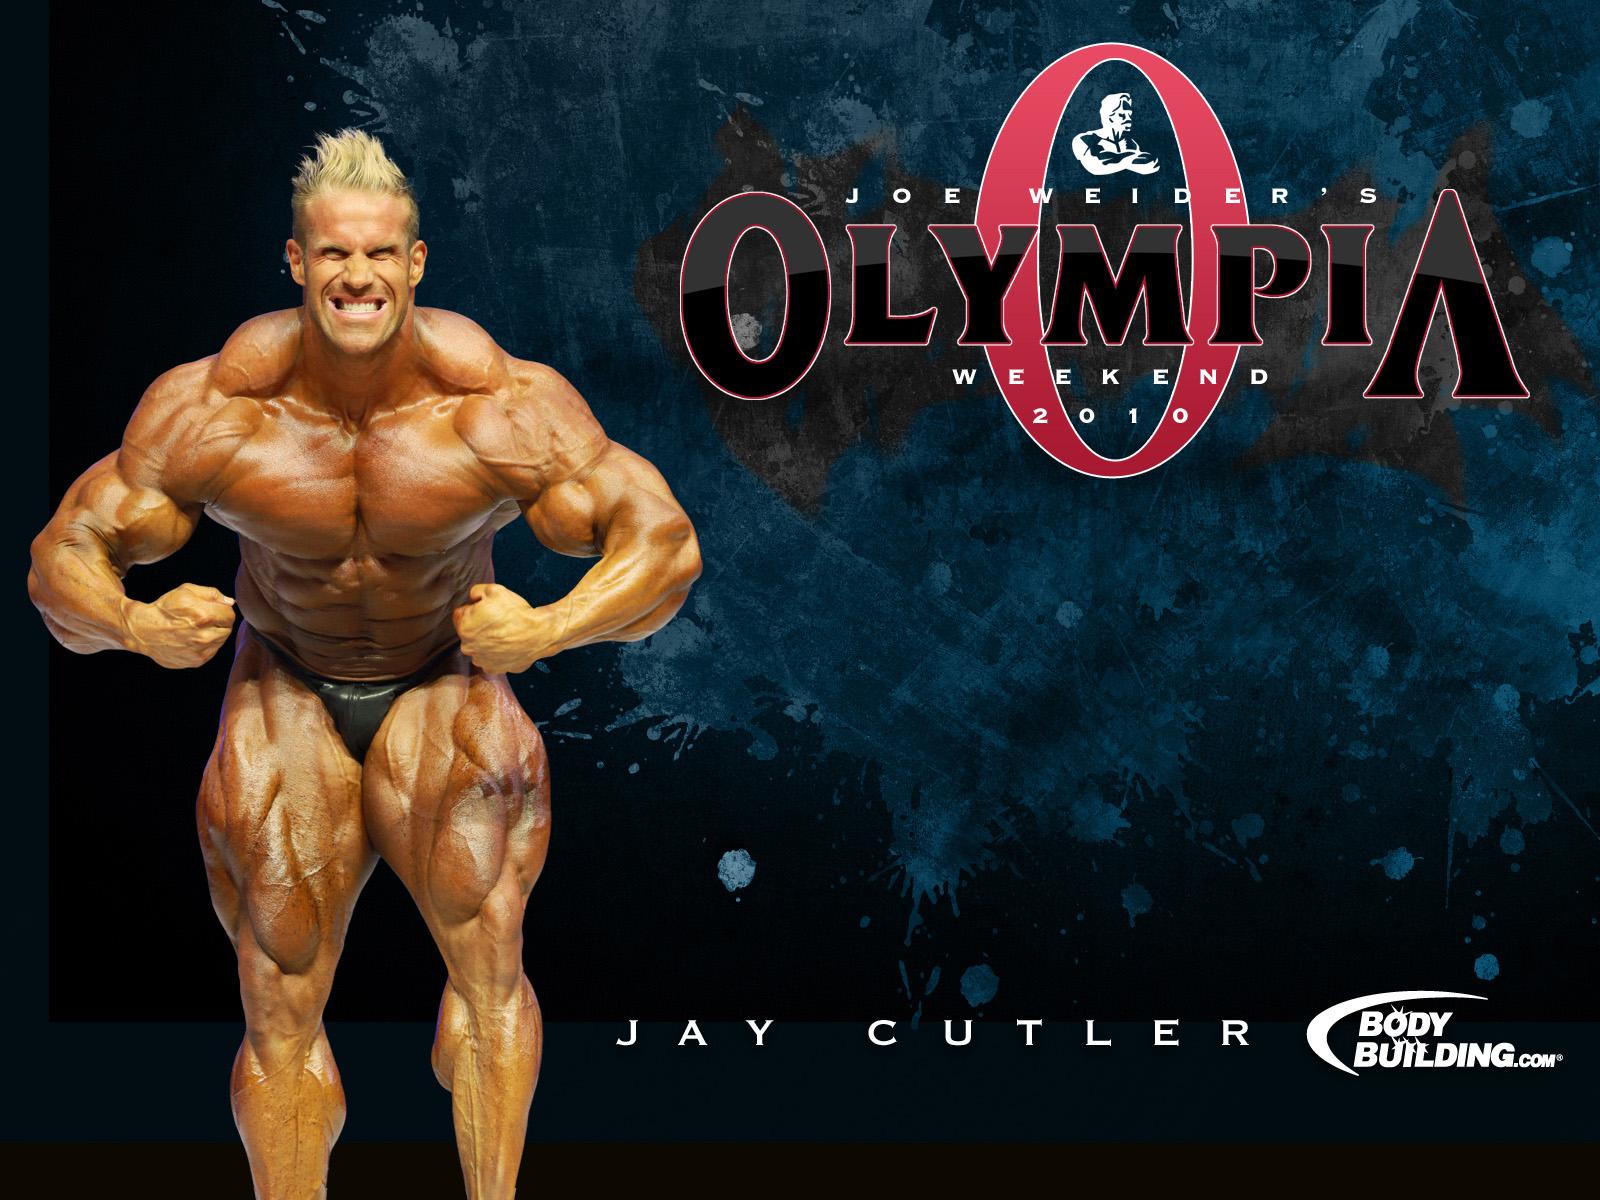 http://4.bp.blogspot.com/-_sY2dnTrdMw/TxzkR67TJWI/AAAAAAAABMU/i8pmBJk_Ad8/s1600/Jay+Cutler+Olympia+Wallpaper.jpg